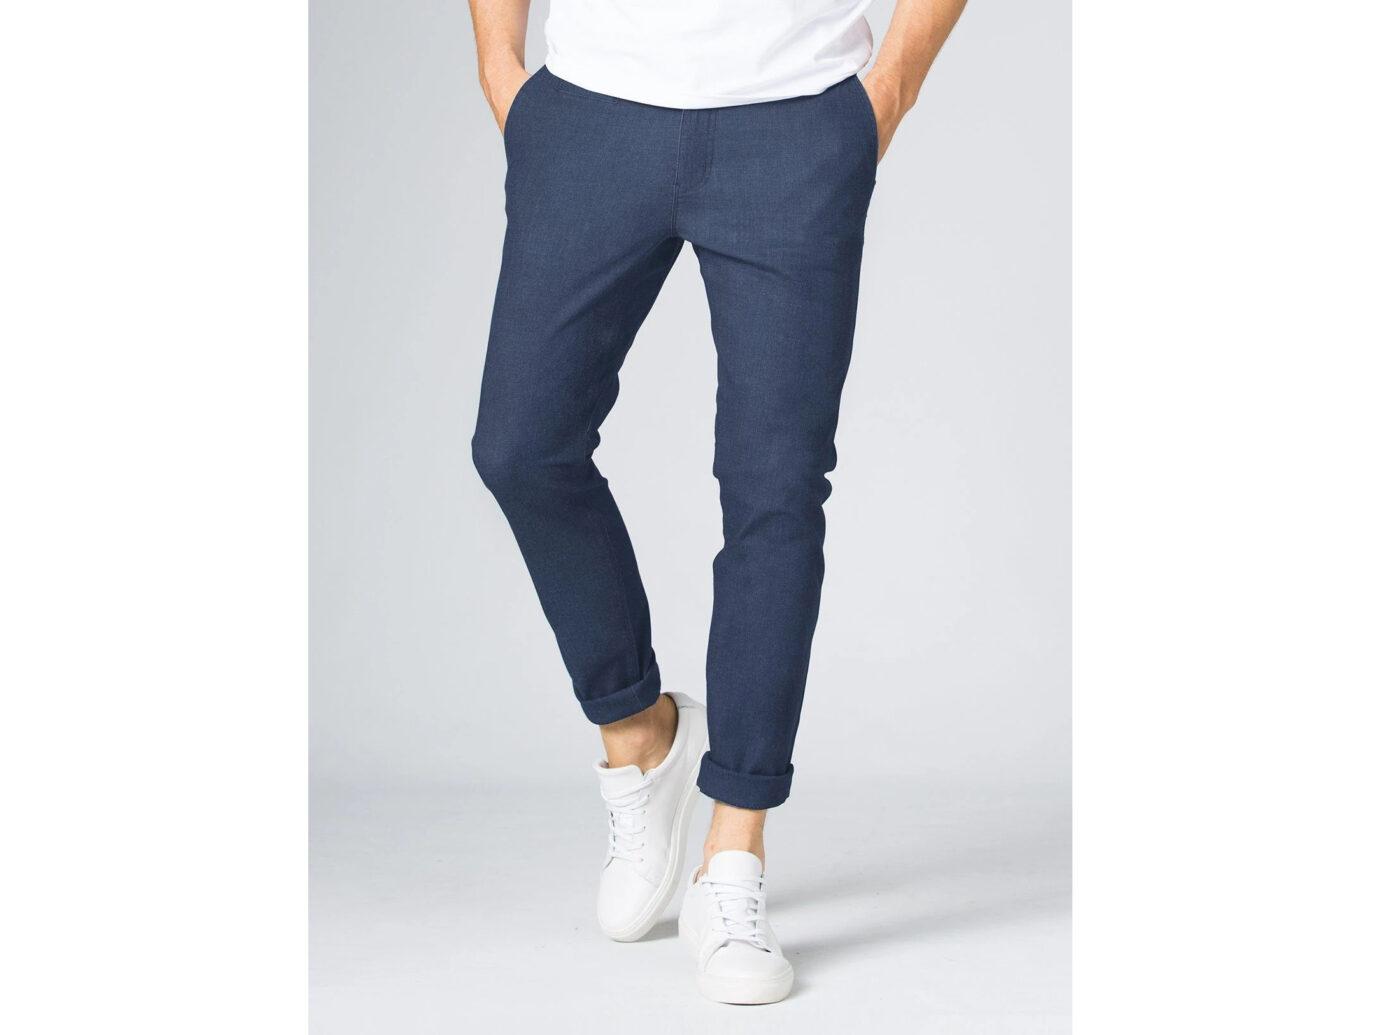 DUER Men's Weightless Denim Beachcomber Jeans